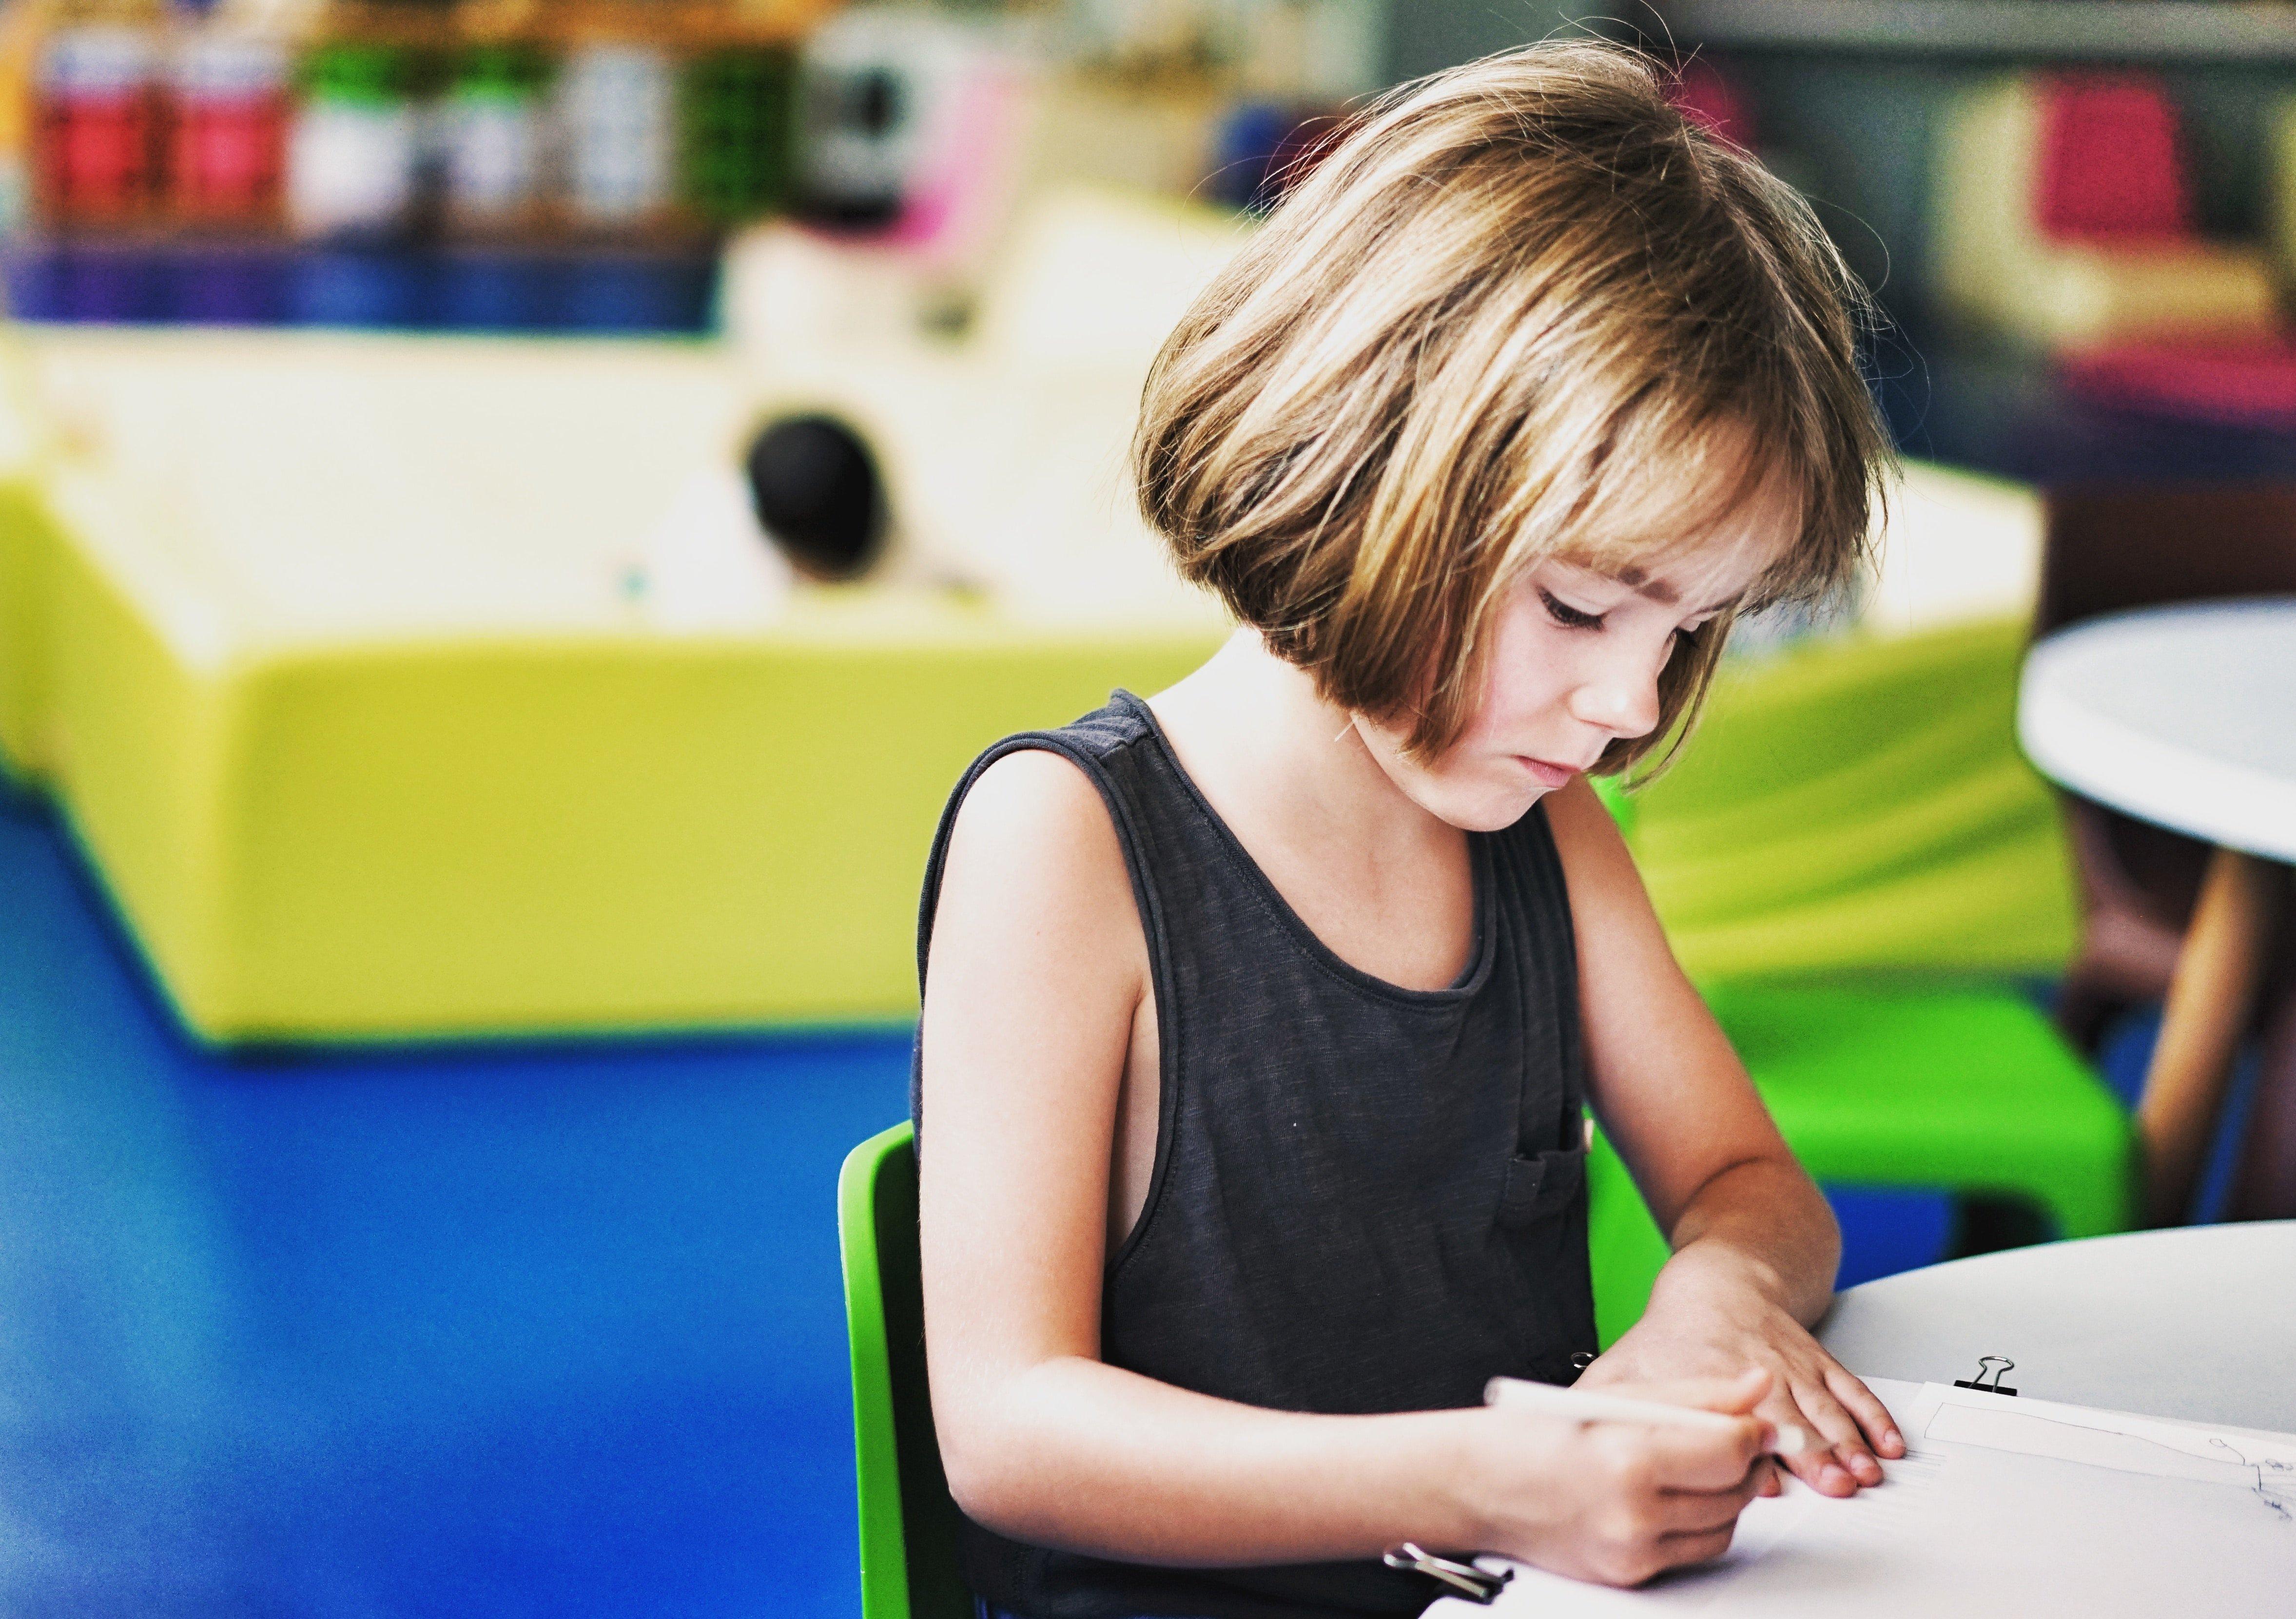 A little girl writing | Source: Unsplash.com